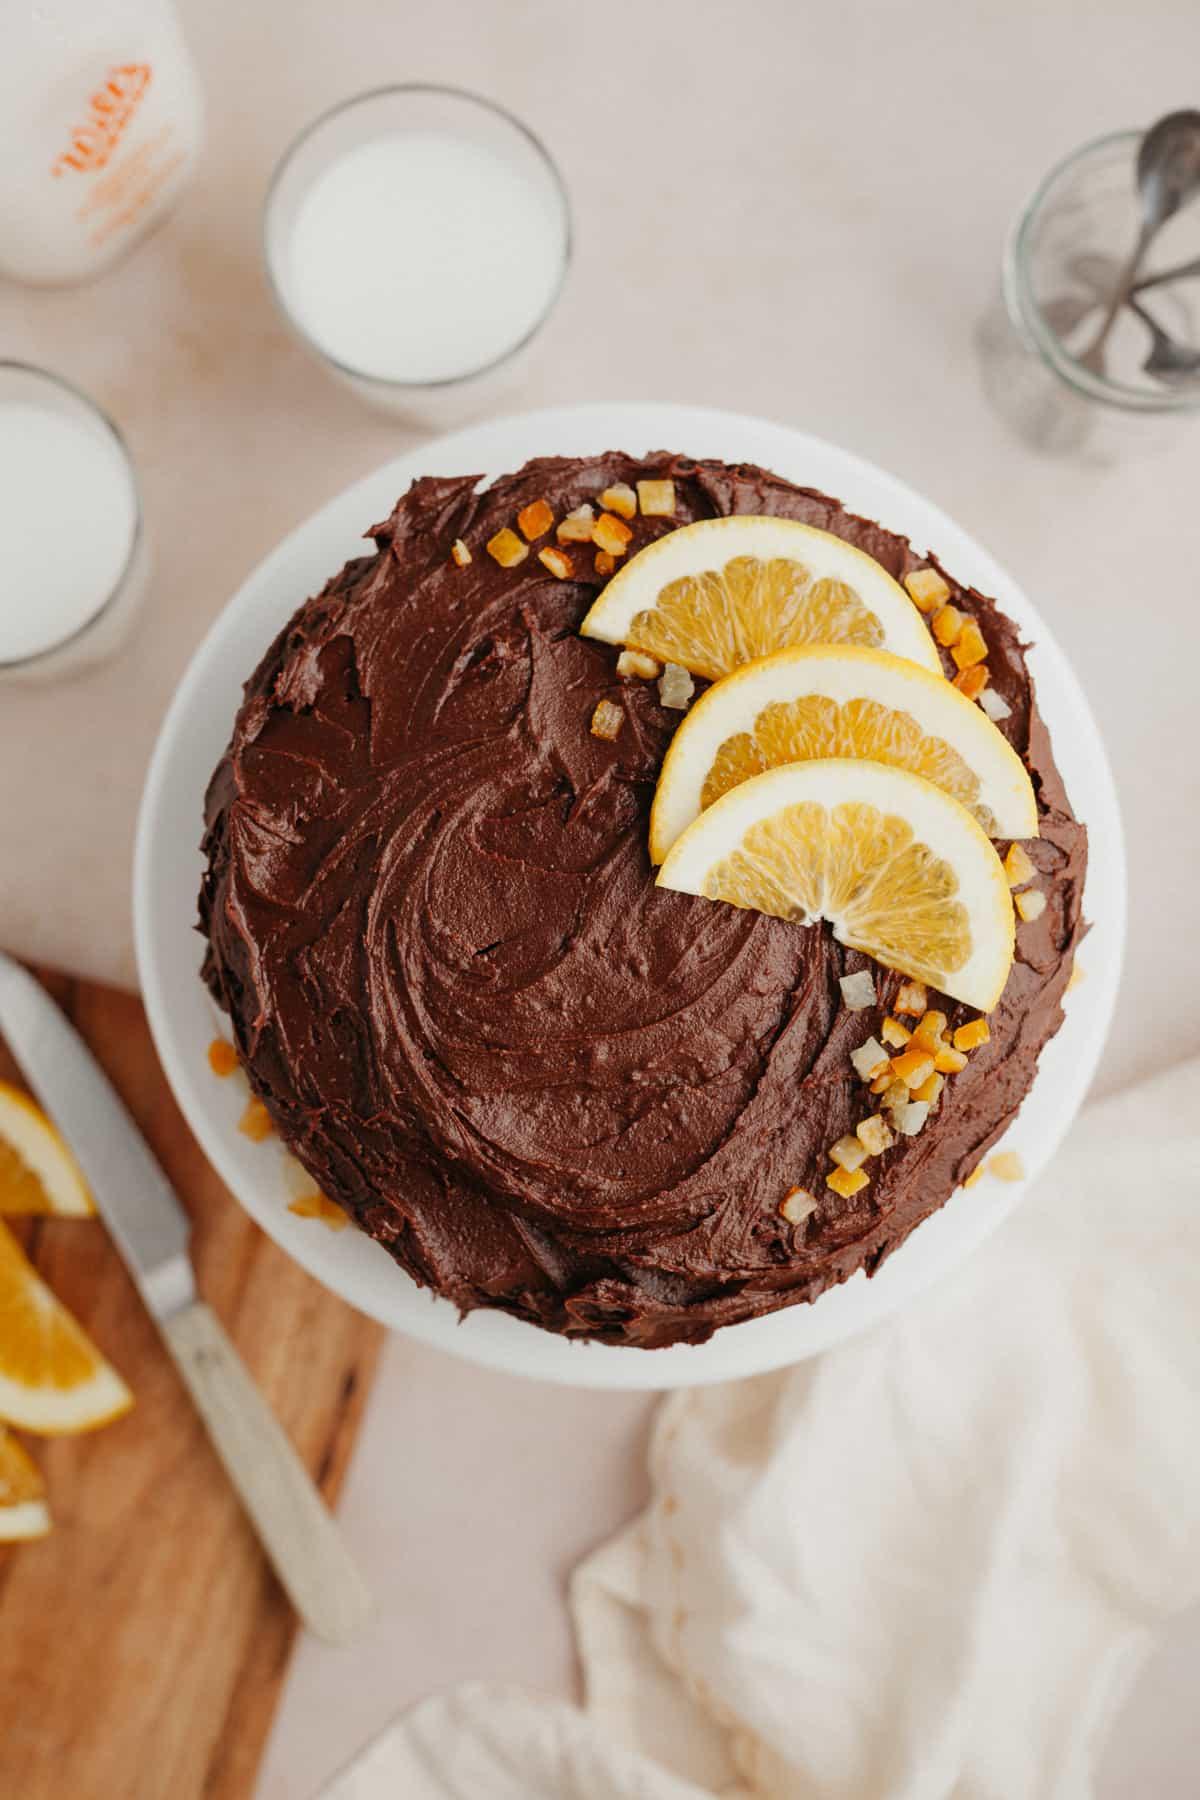 Overhead shot of a chocolate orange cake